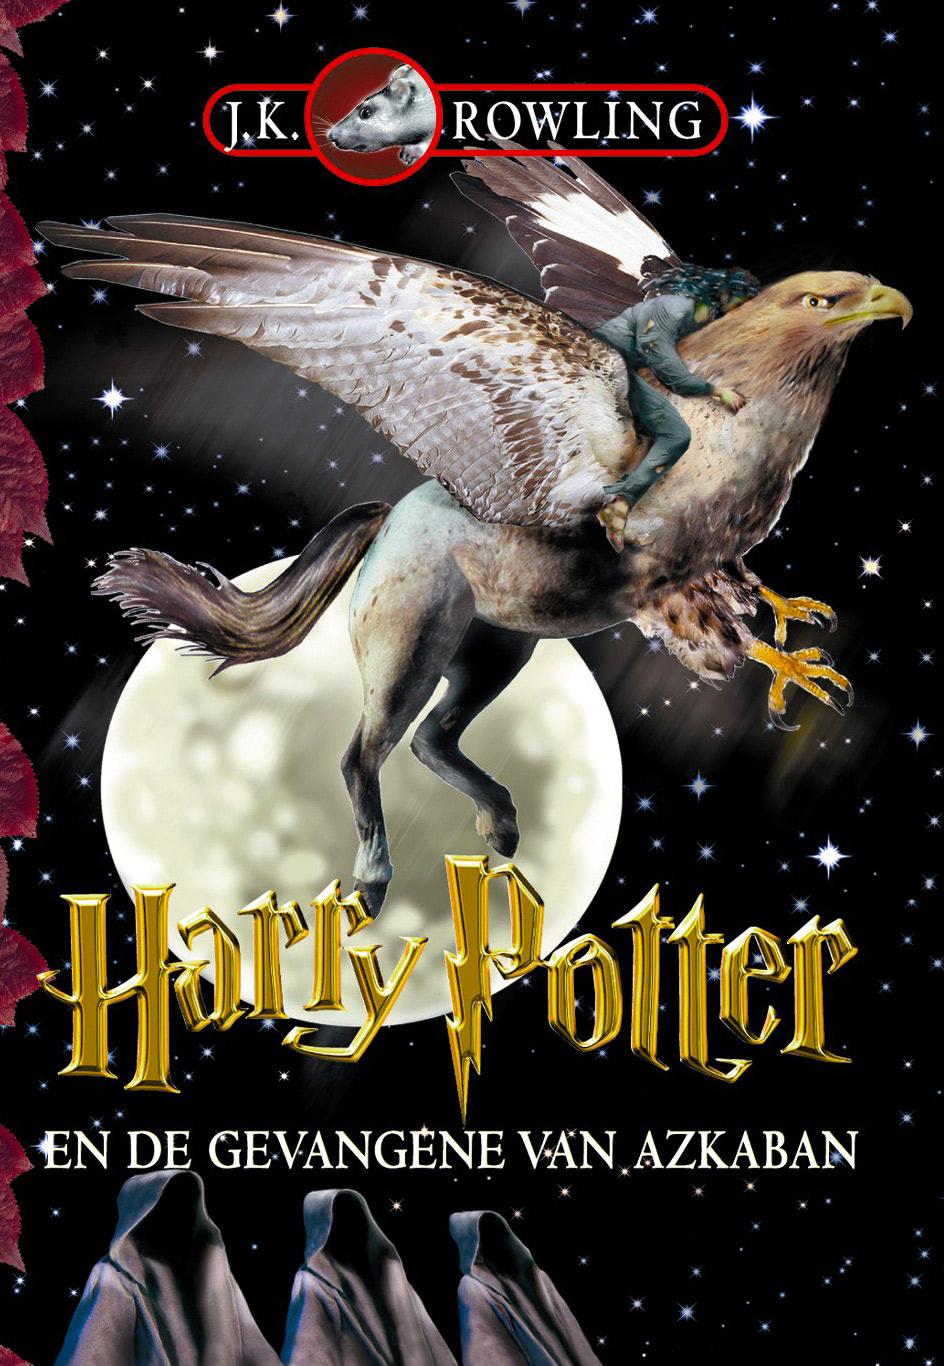 'Prisoner of Azkaban' Dutch edition